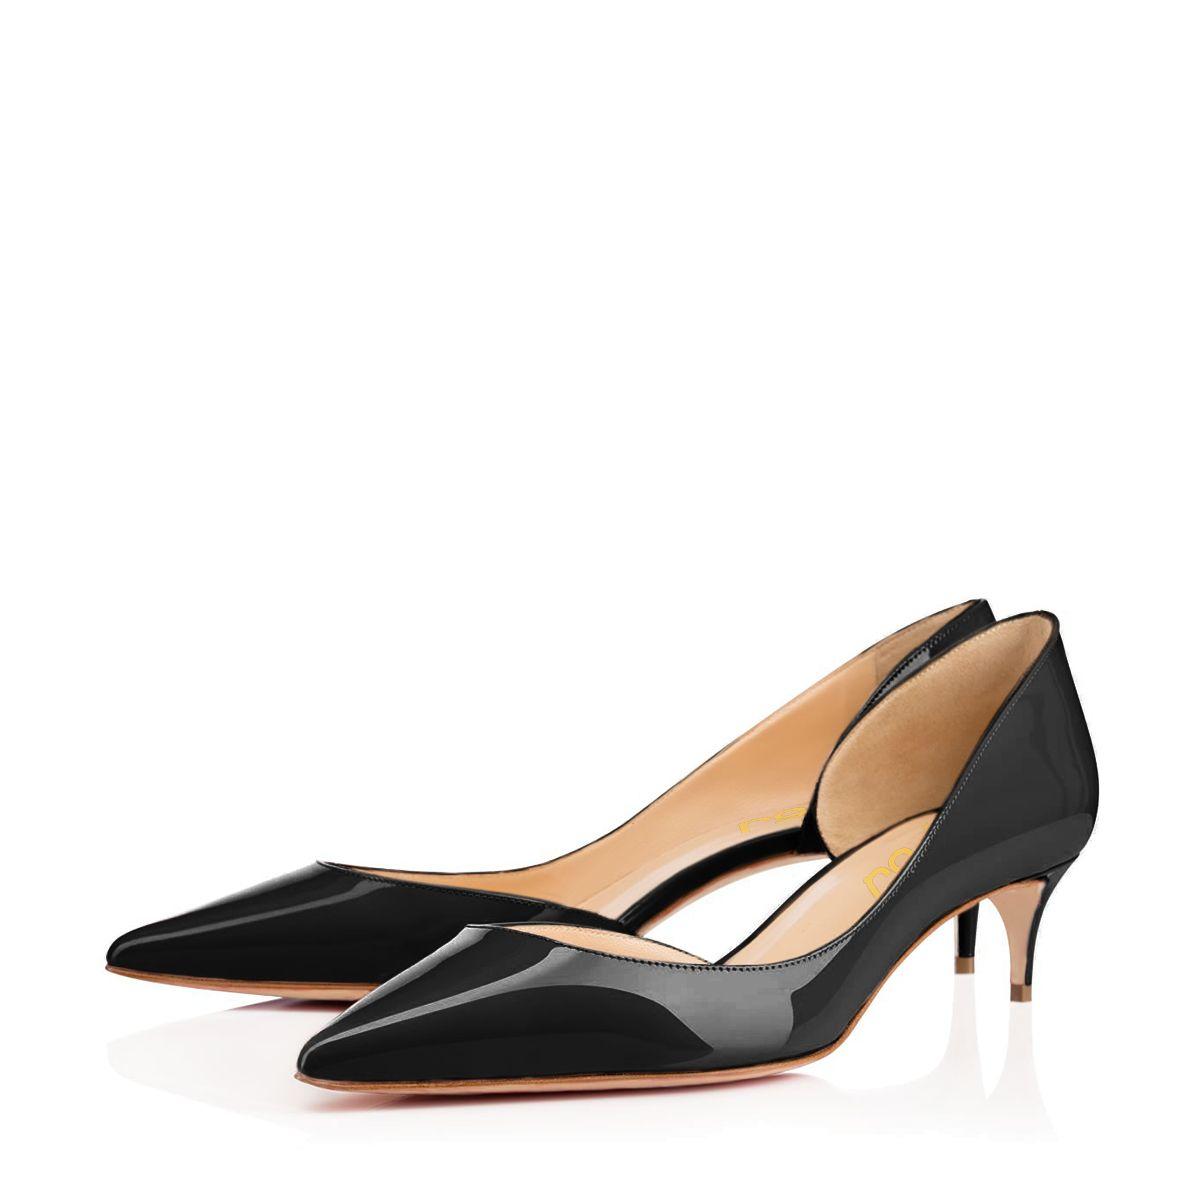 Black Kitten Heels Dress Shoes Pointy Toe Patent Leather D